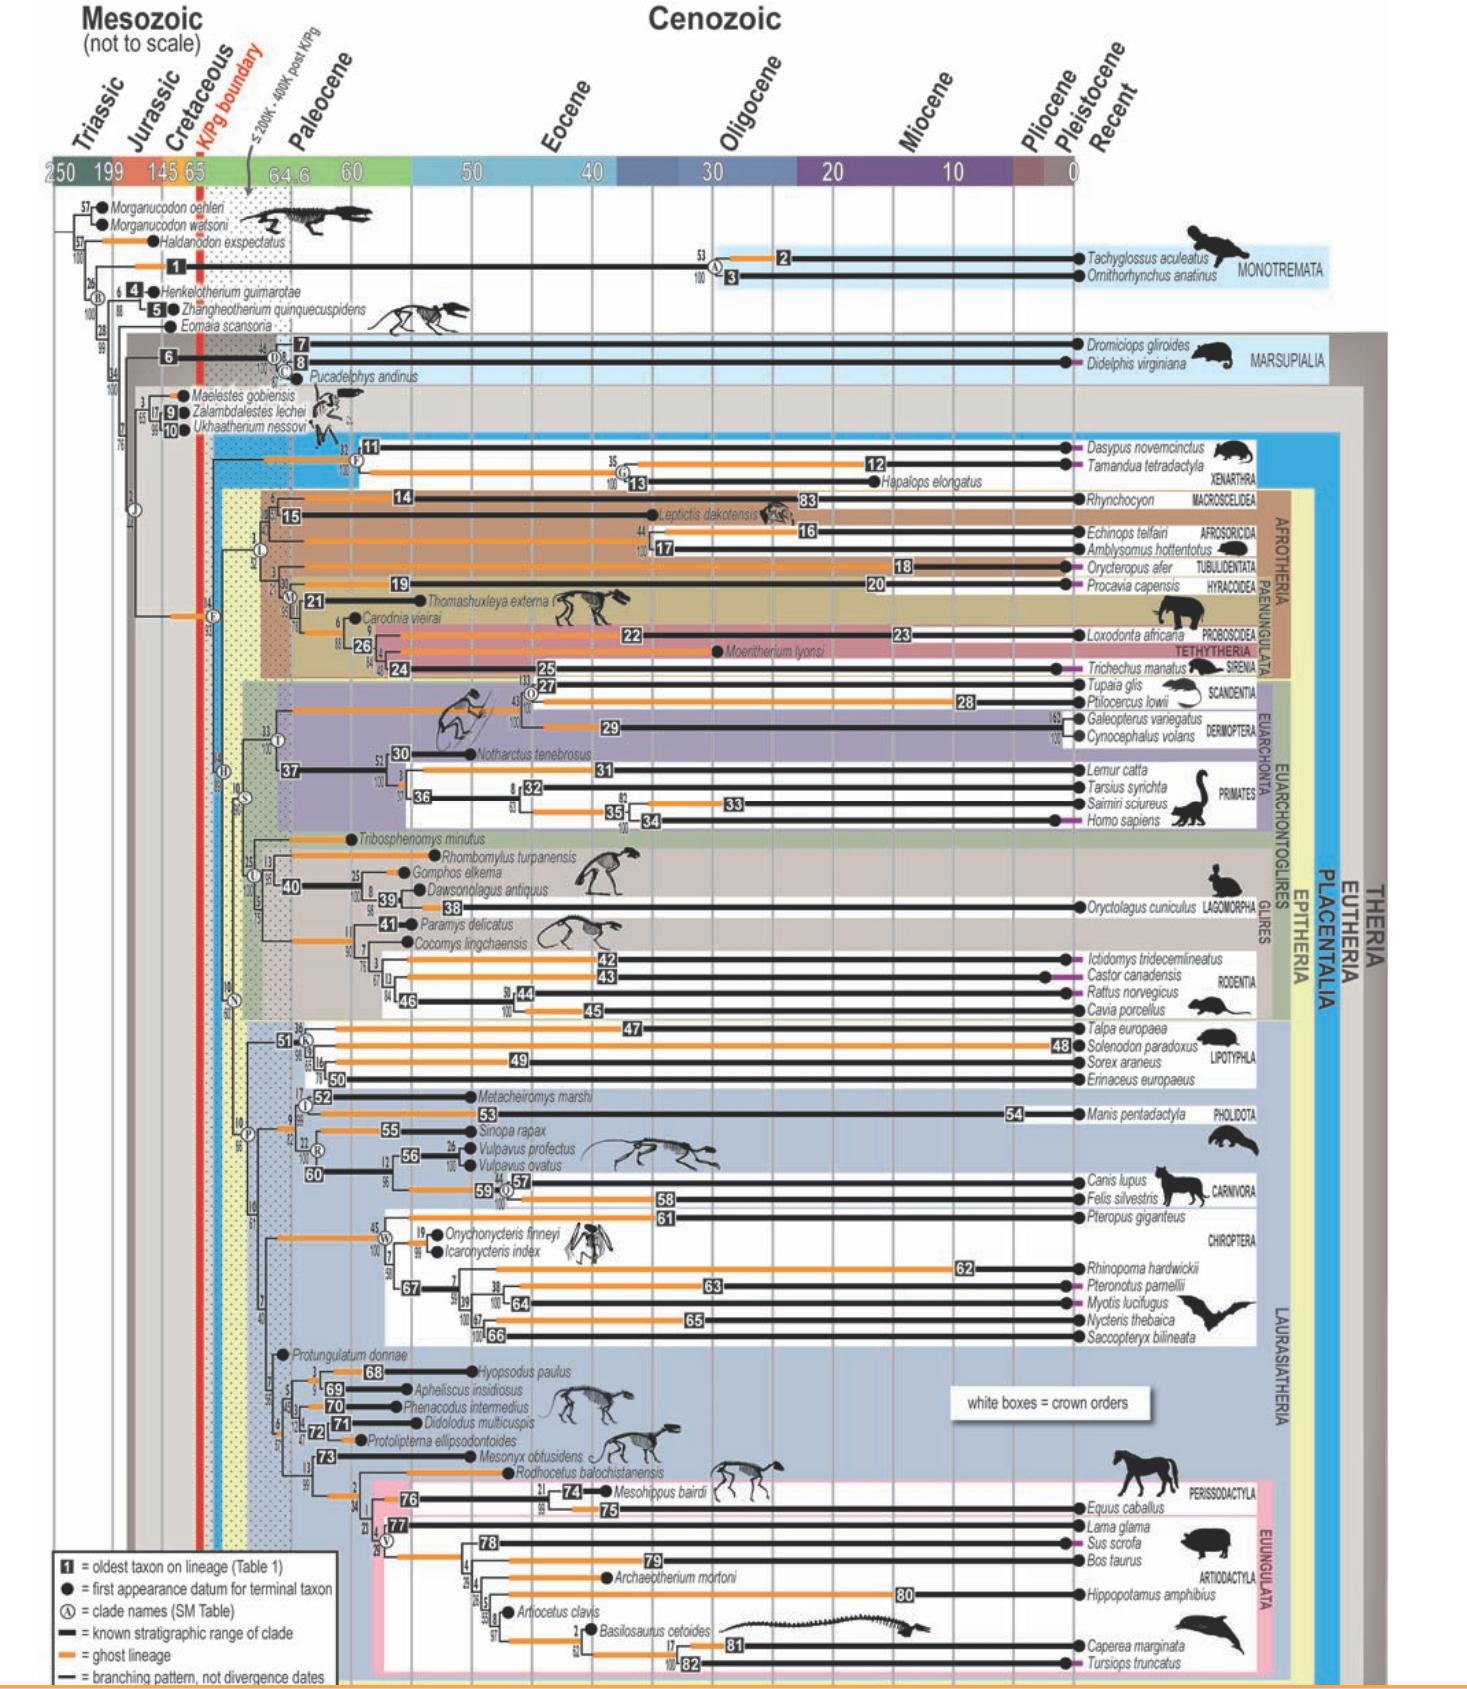 mammalCladogramFull